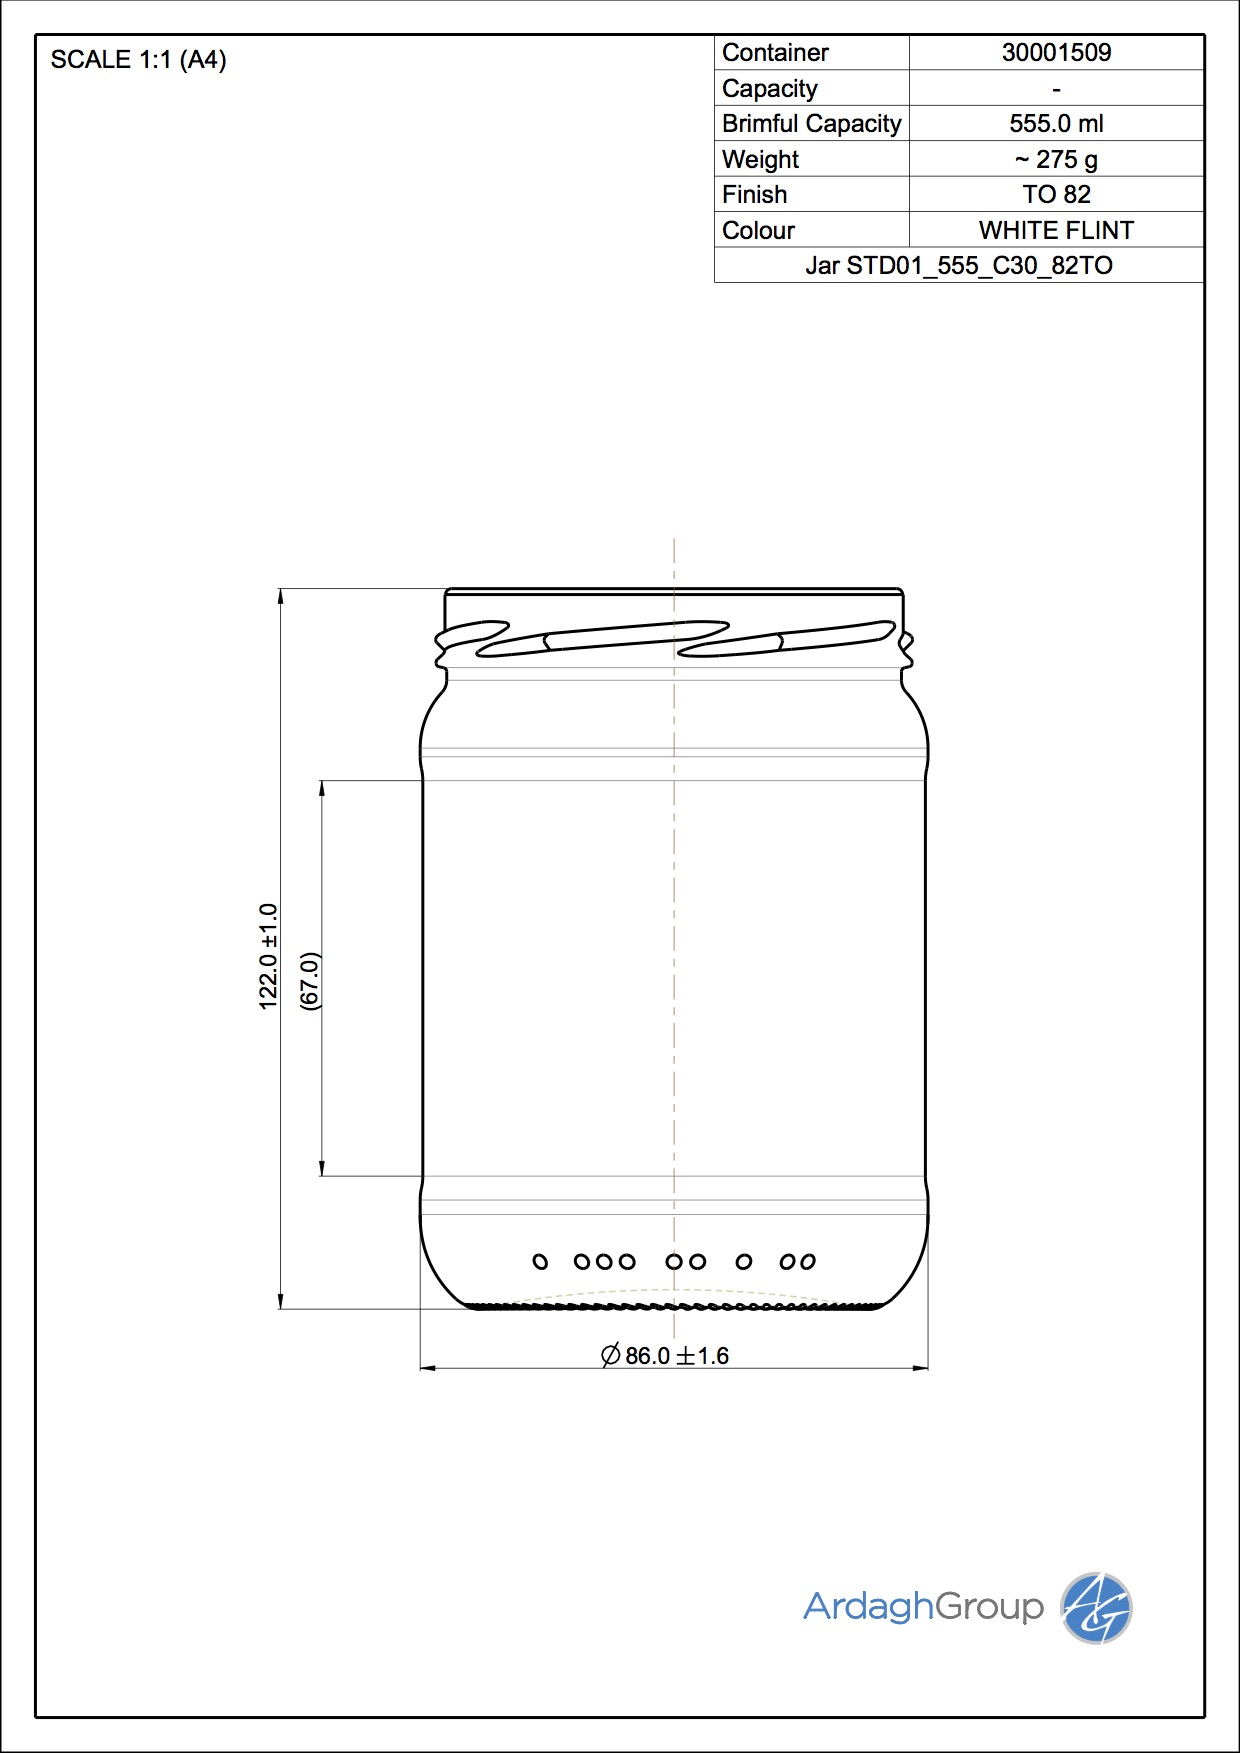 Jar STD01 555 C30 82TO